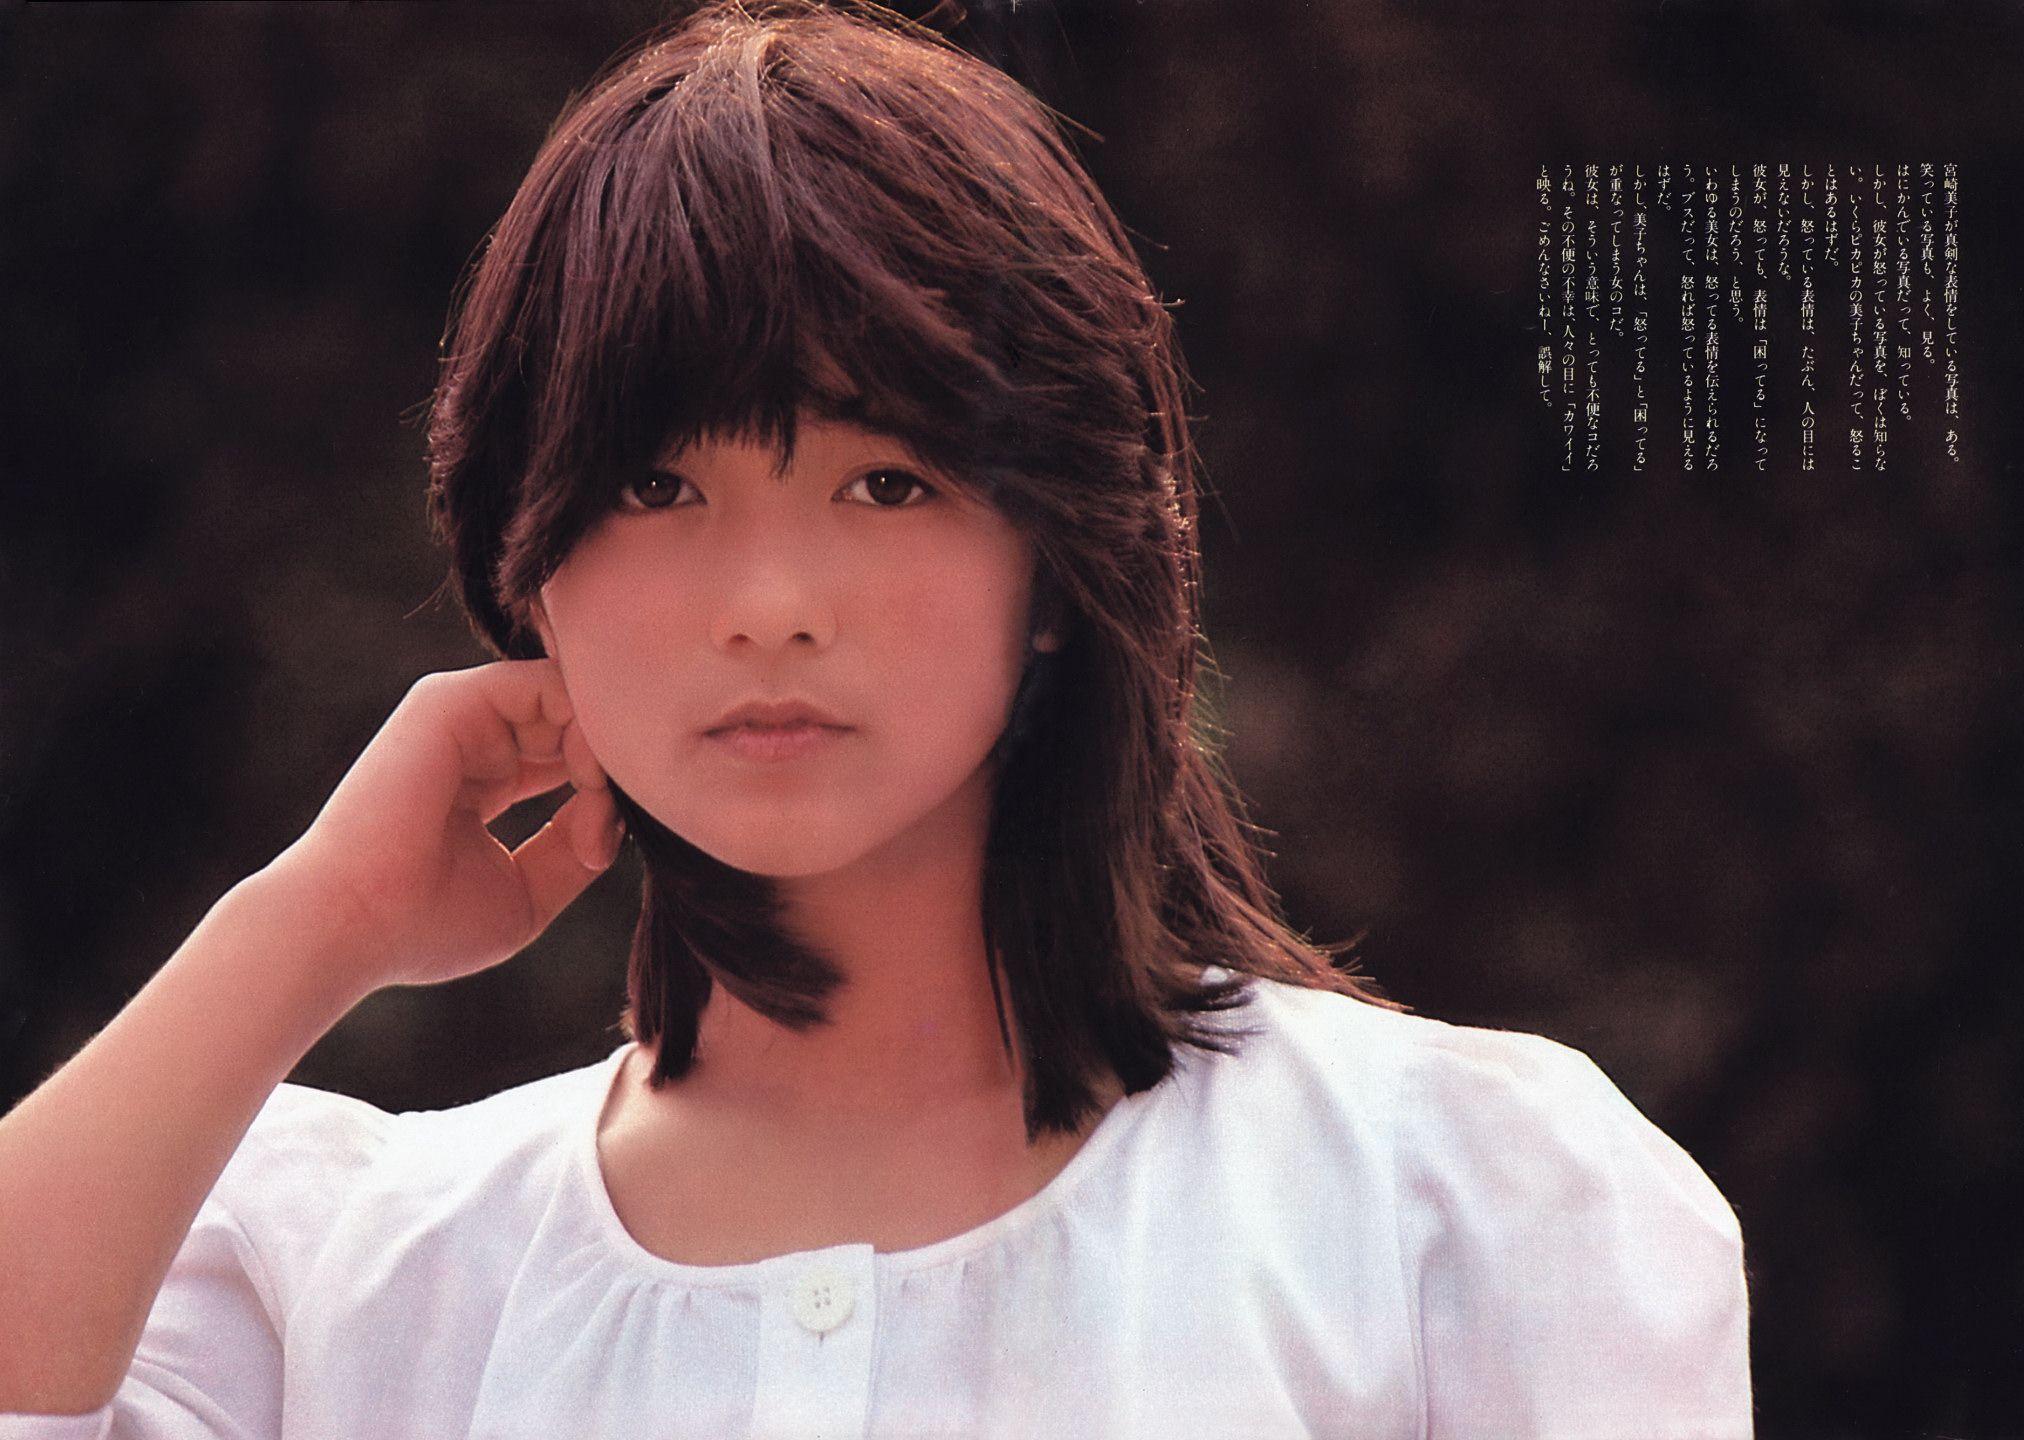 宮崎美子 若い頃